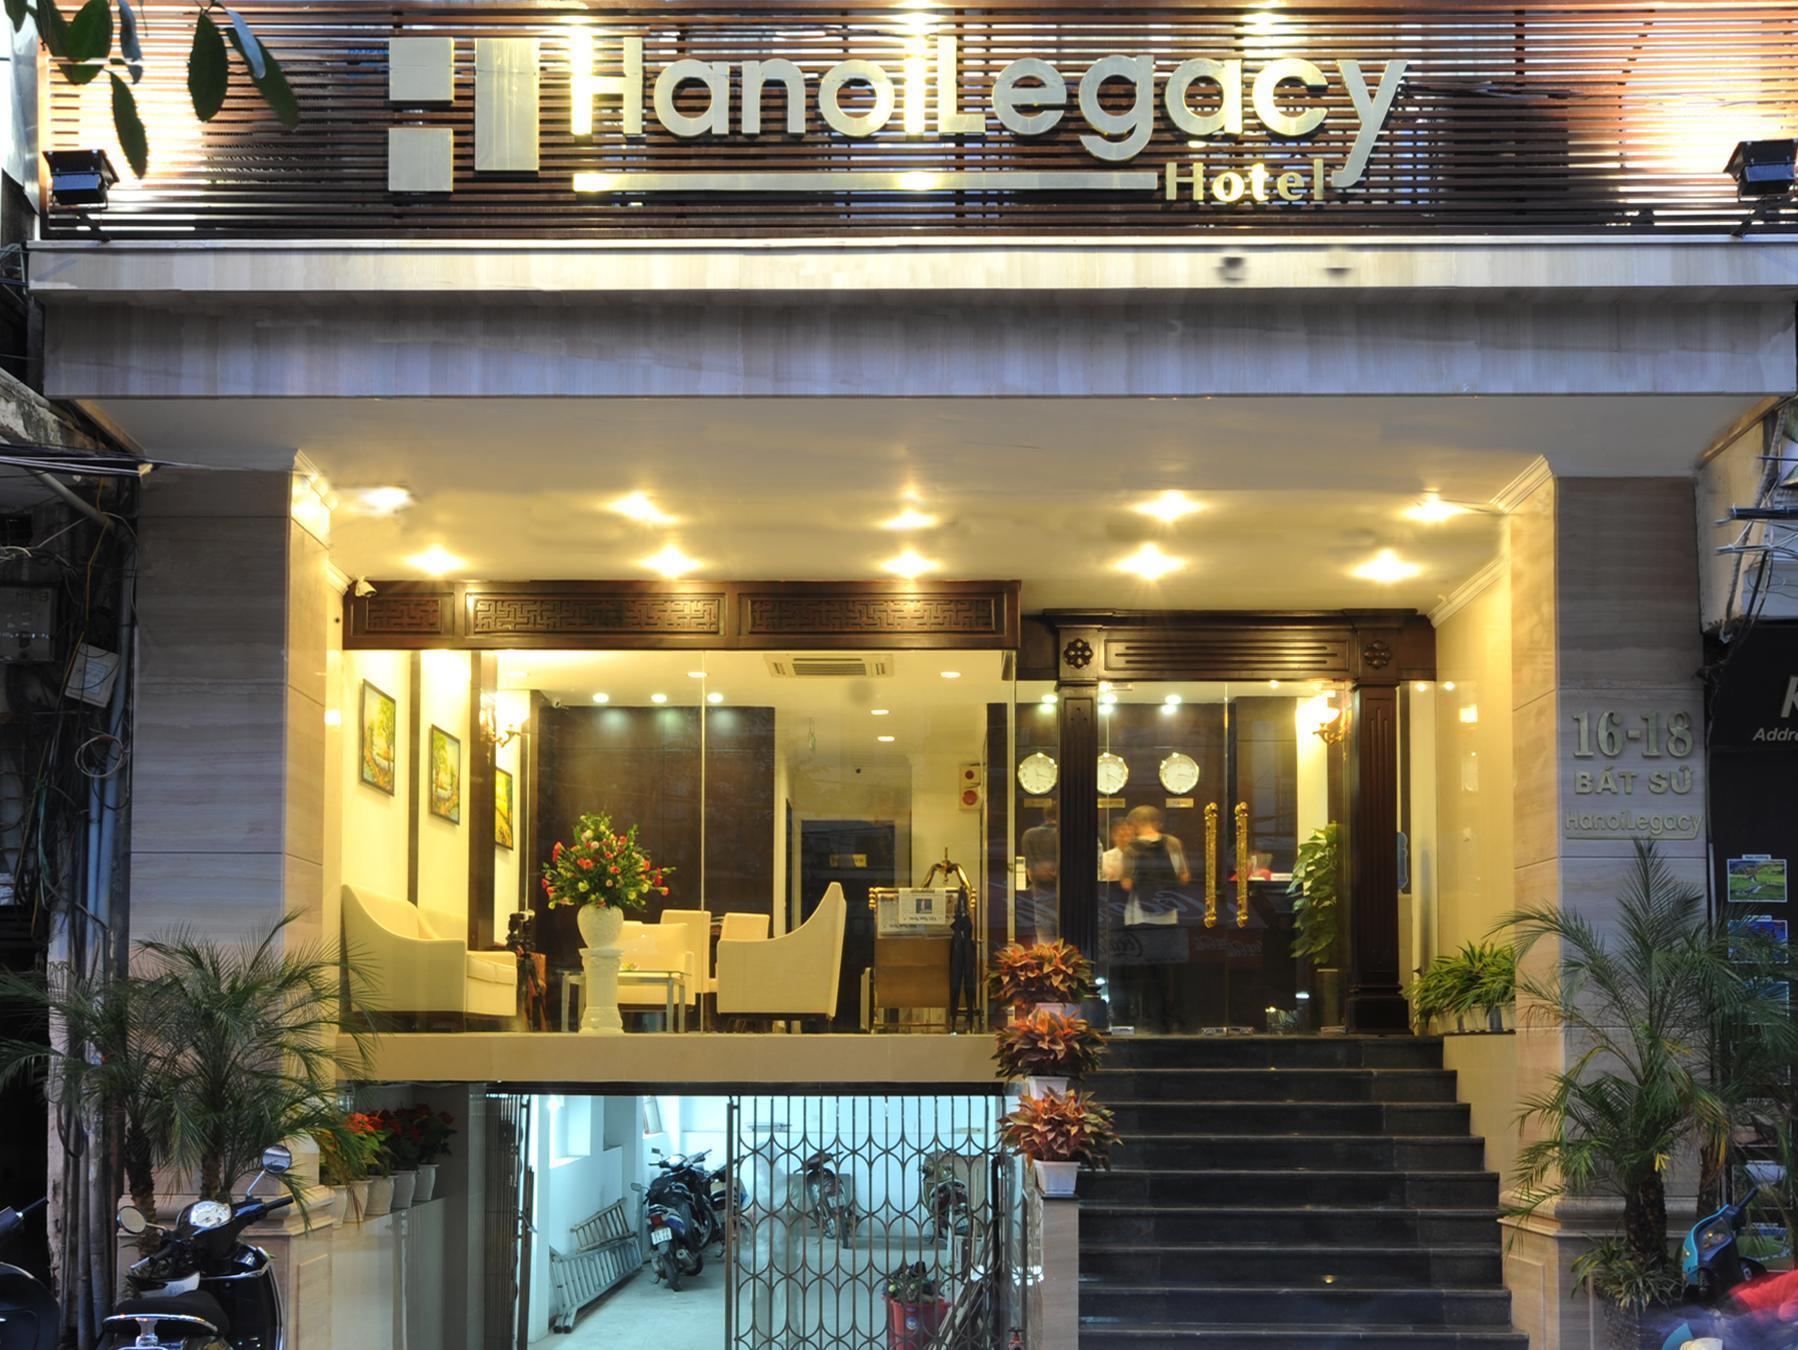 Hanoi Legacy Hotel - Bat Su - Hotell och Boende i Vietnam , Hanoi